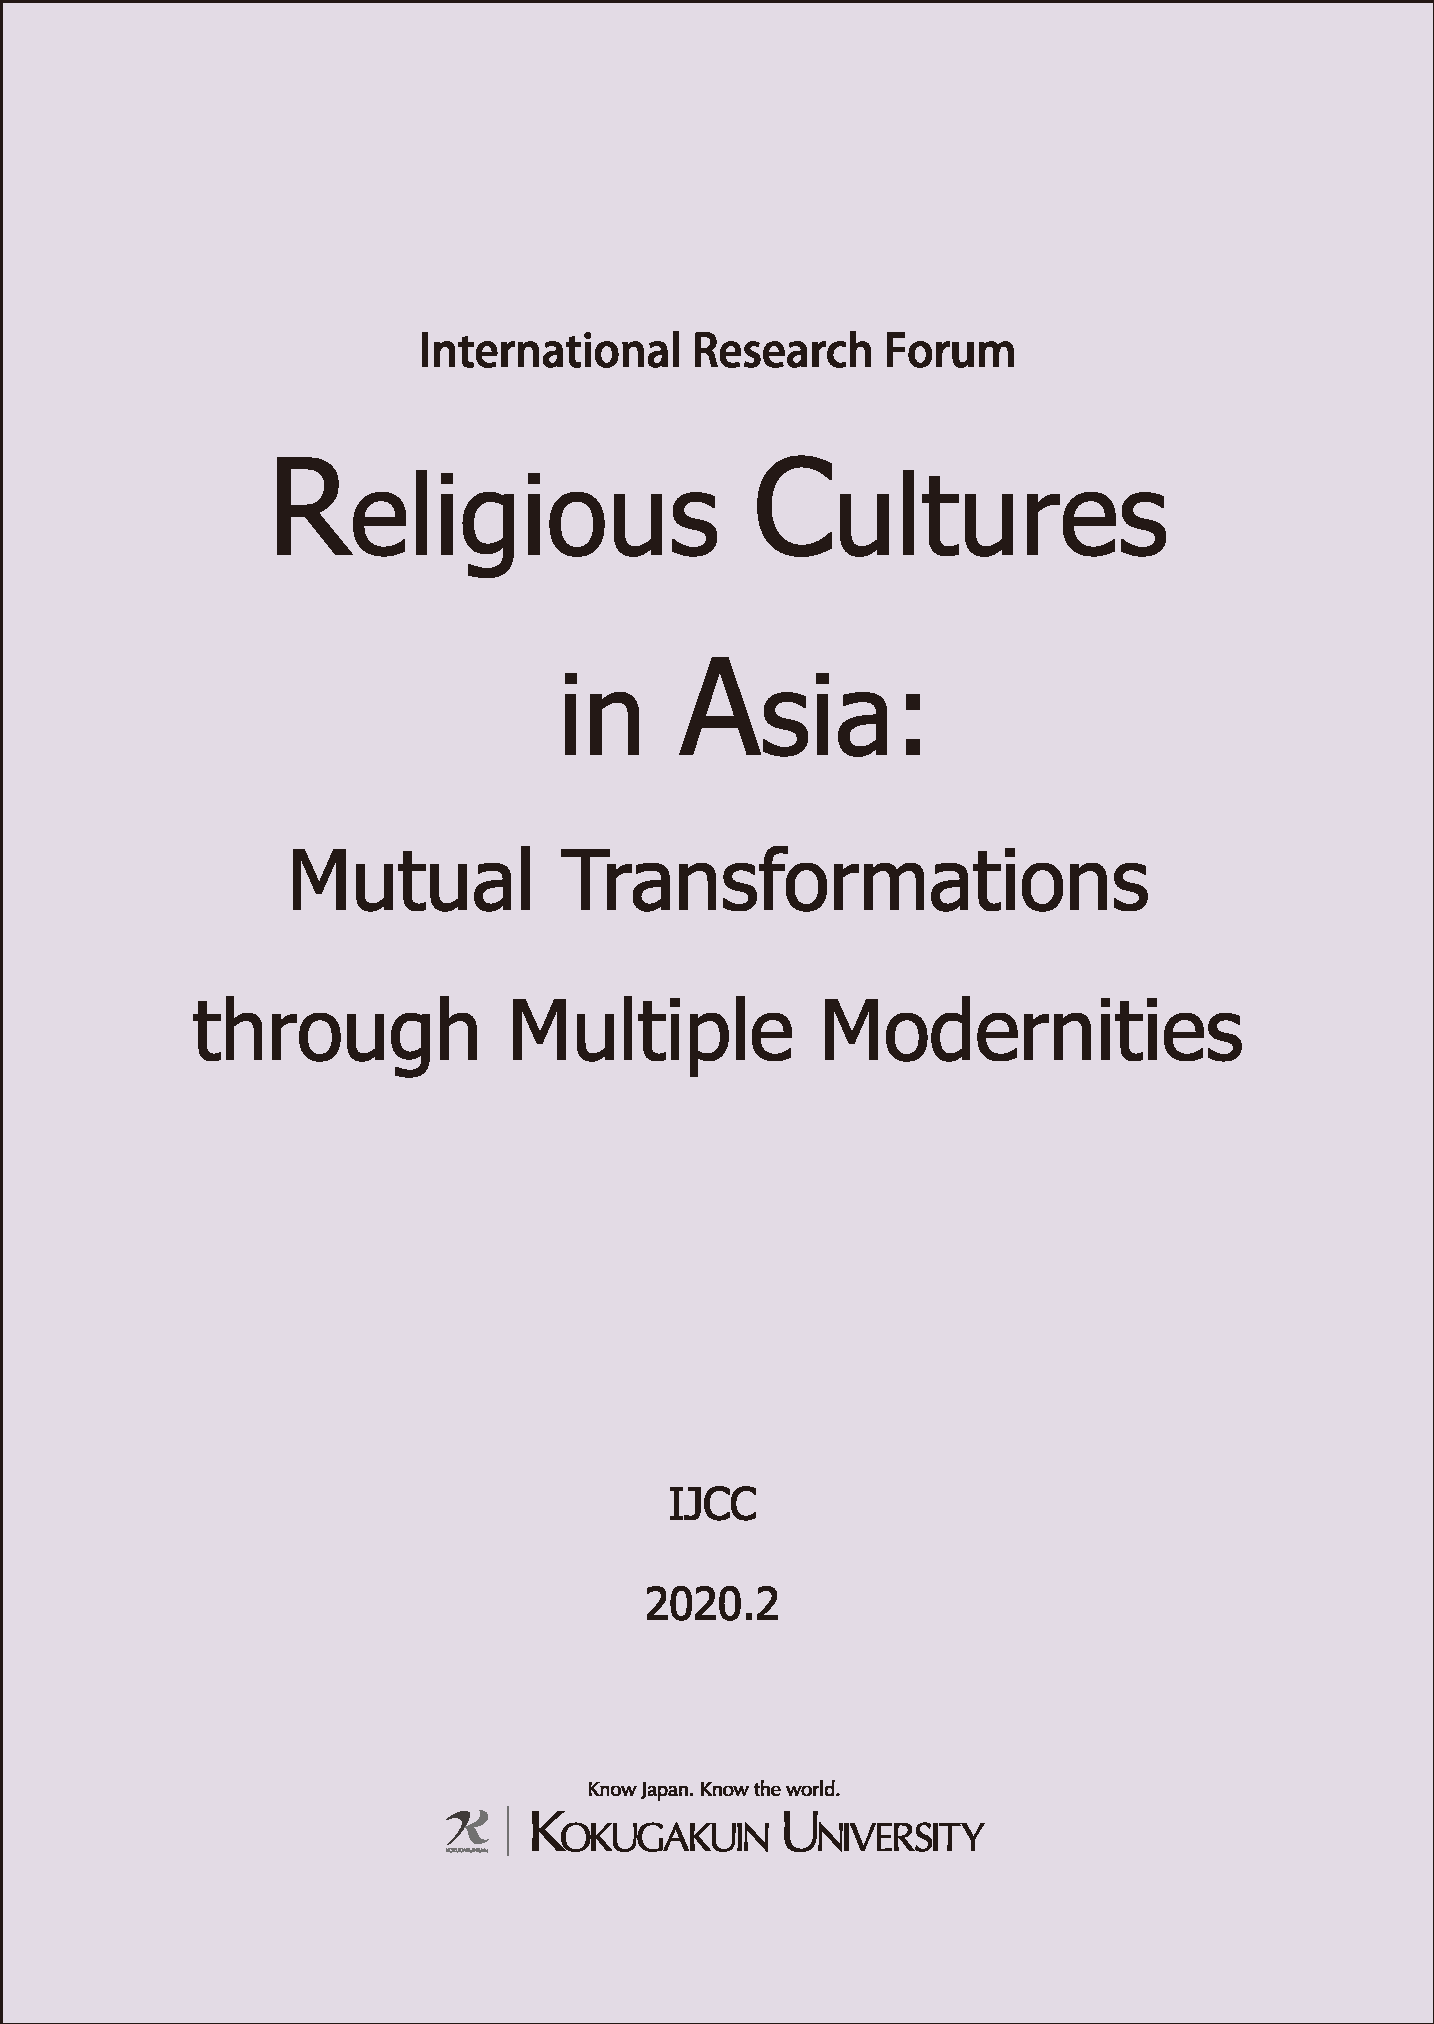 RCiA-cover-web